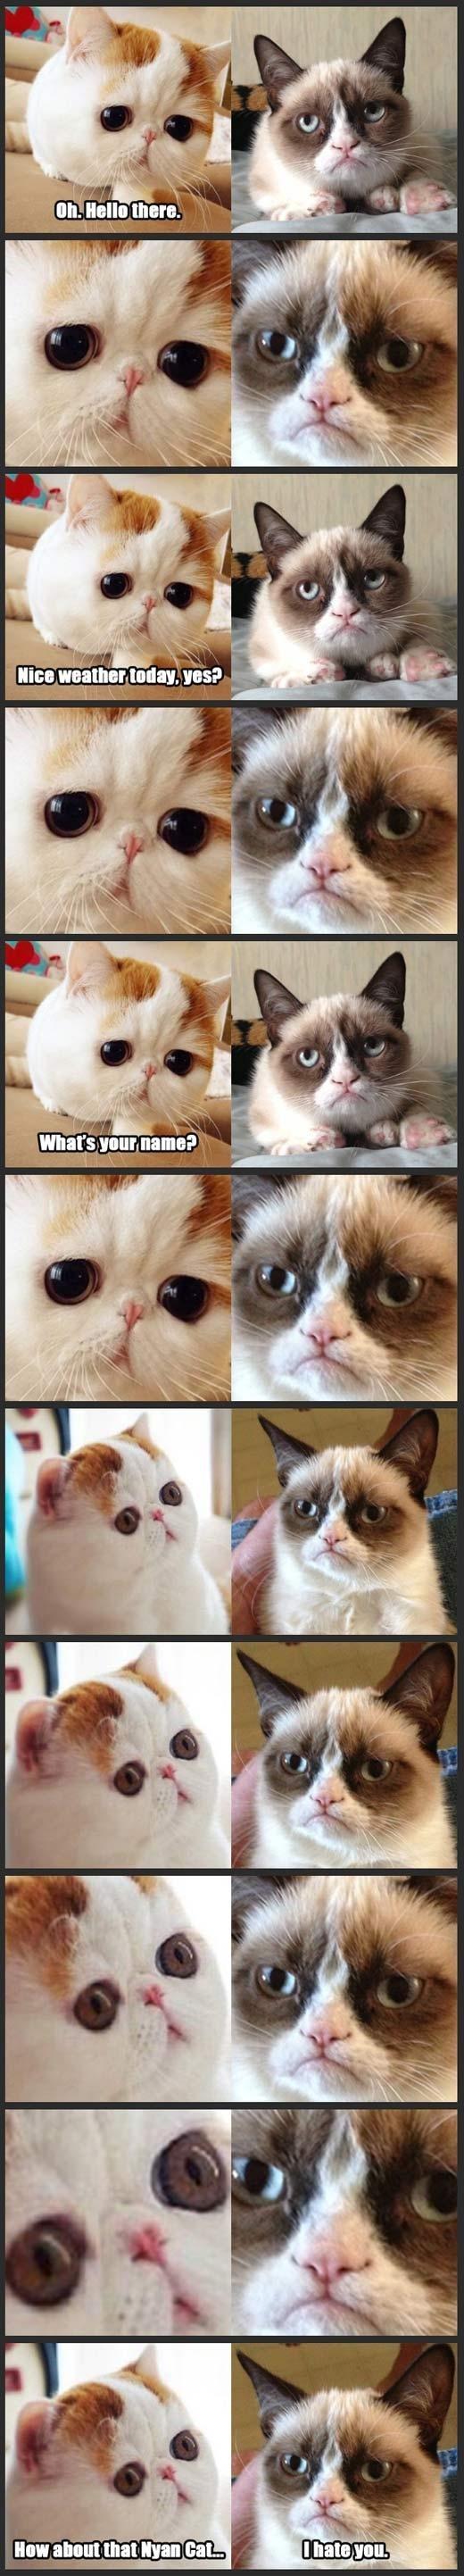 hello-there-grumpy-cat